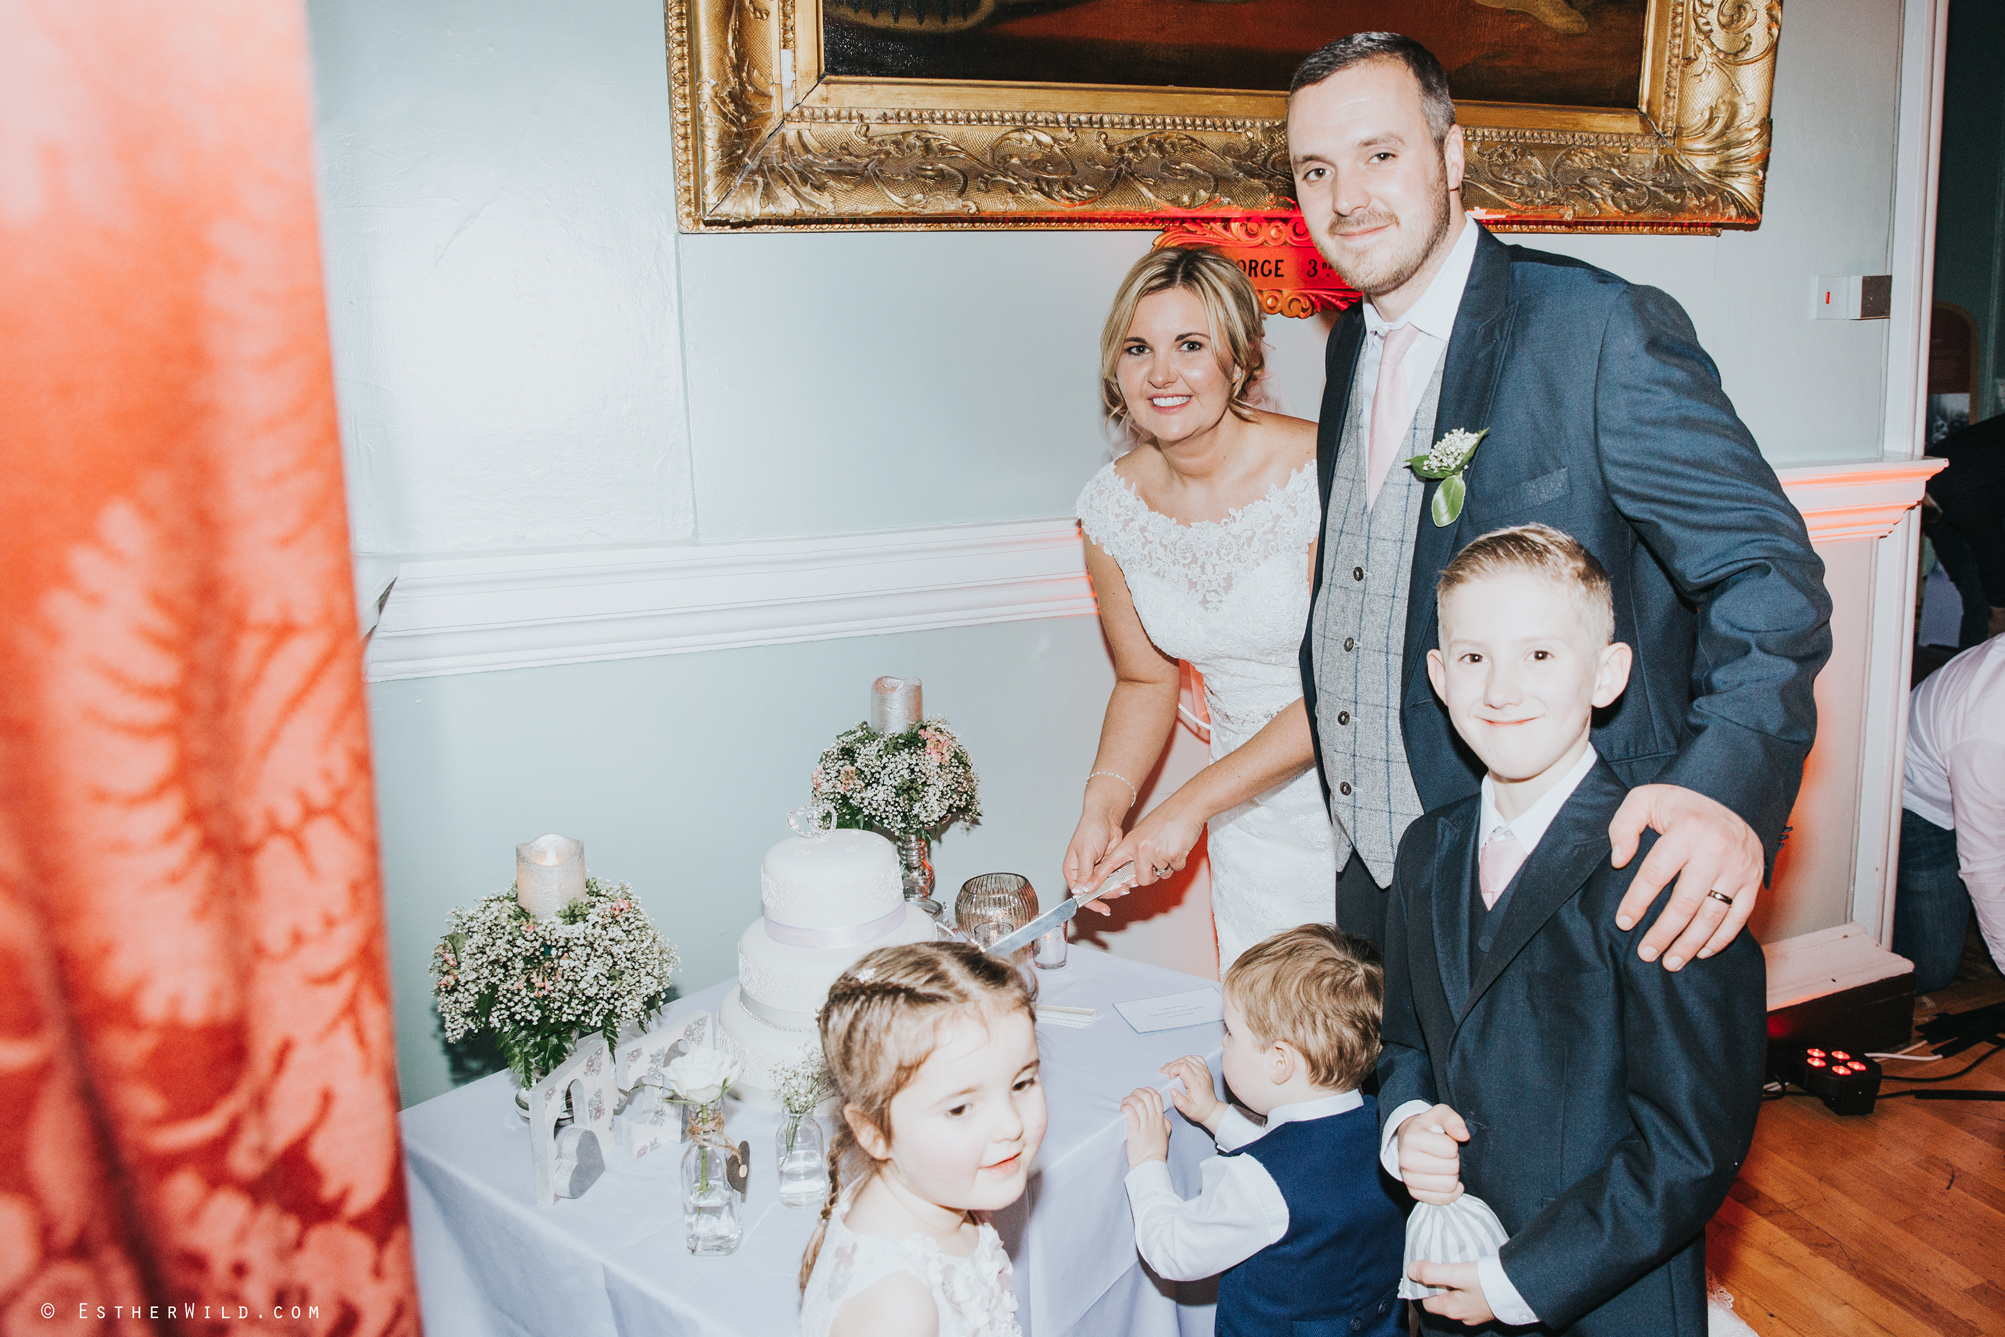 Wedding_Kings_Lynn_Town_Hall_Norfolk_Photographer_Esther_Wild_IMG_1819_IMGL0713.jpg